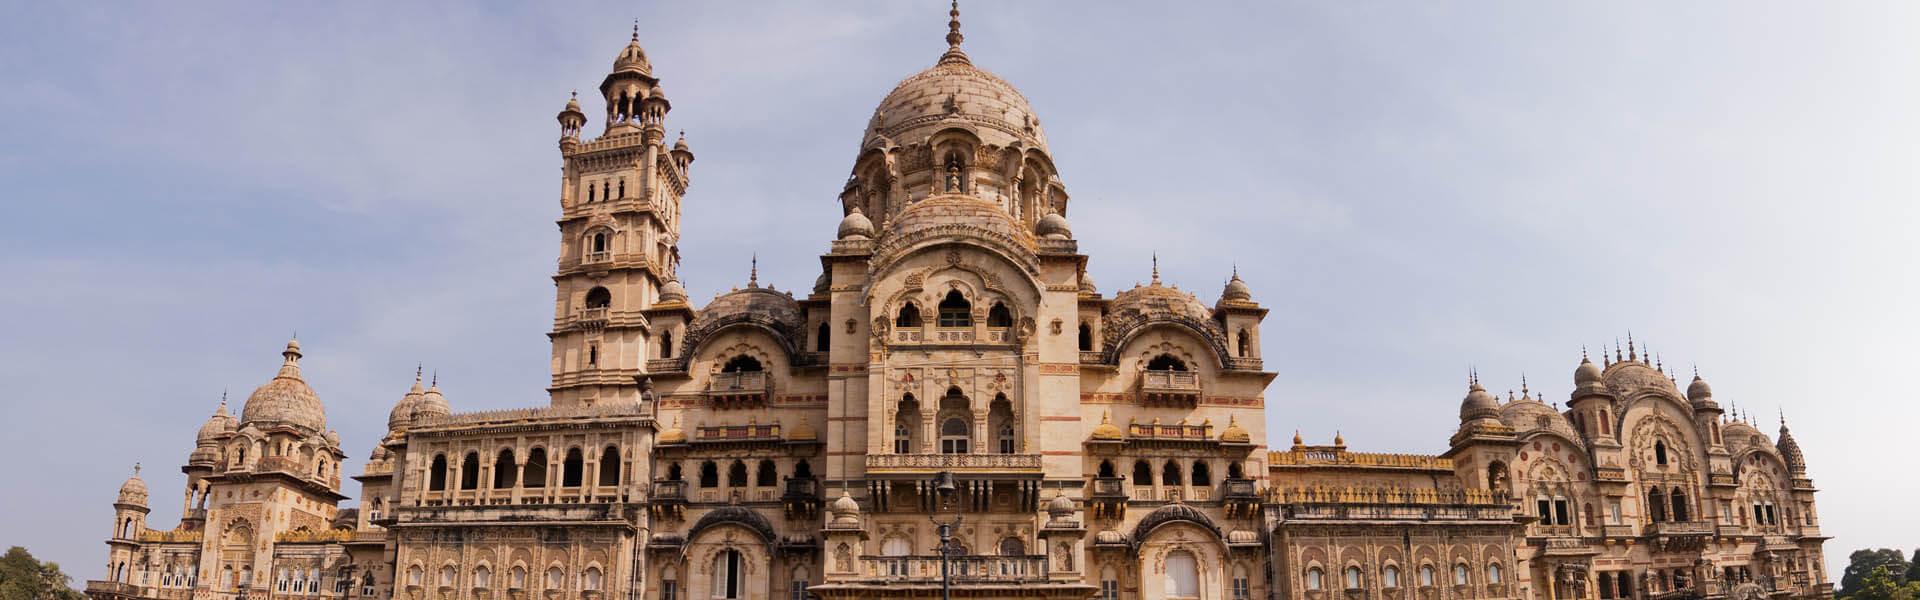 Gujarat Explorer,gujarat tourism,attractions of gujarat